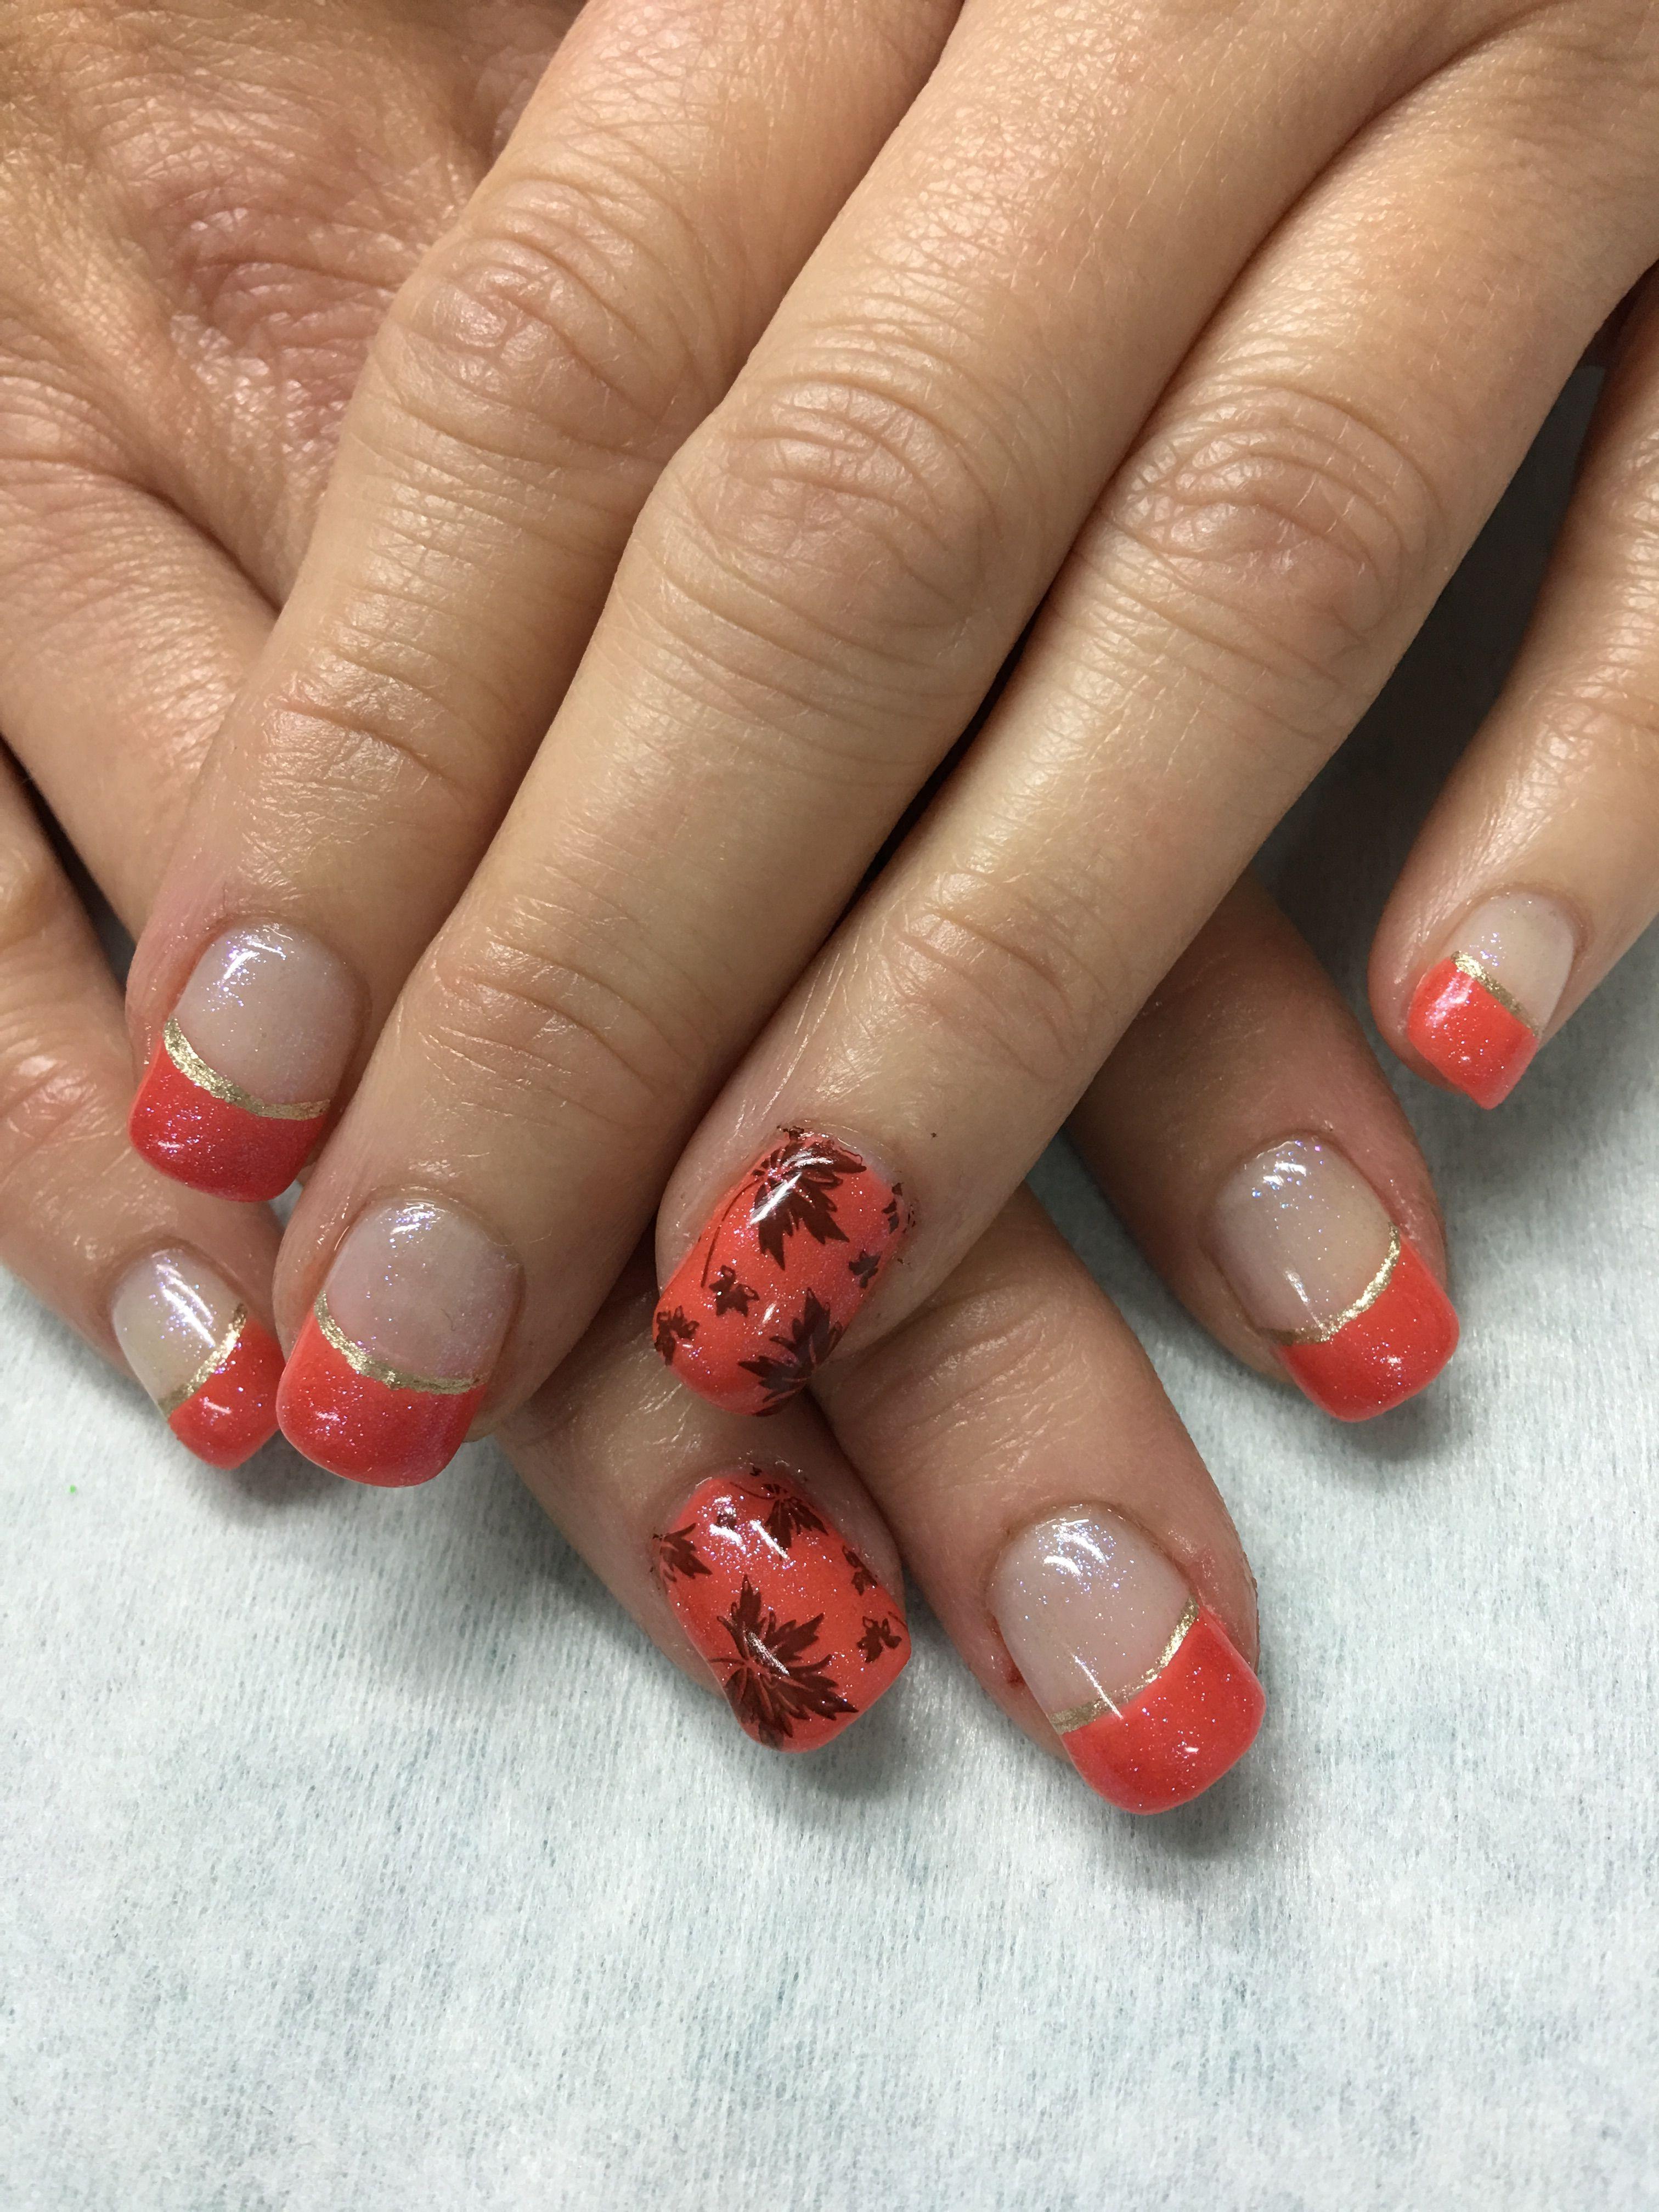 Fall Nails Shimmer Orange Stamped Leaves French Gel Nails Gel